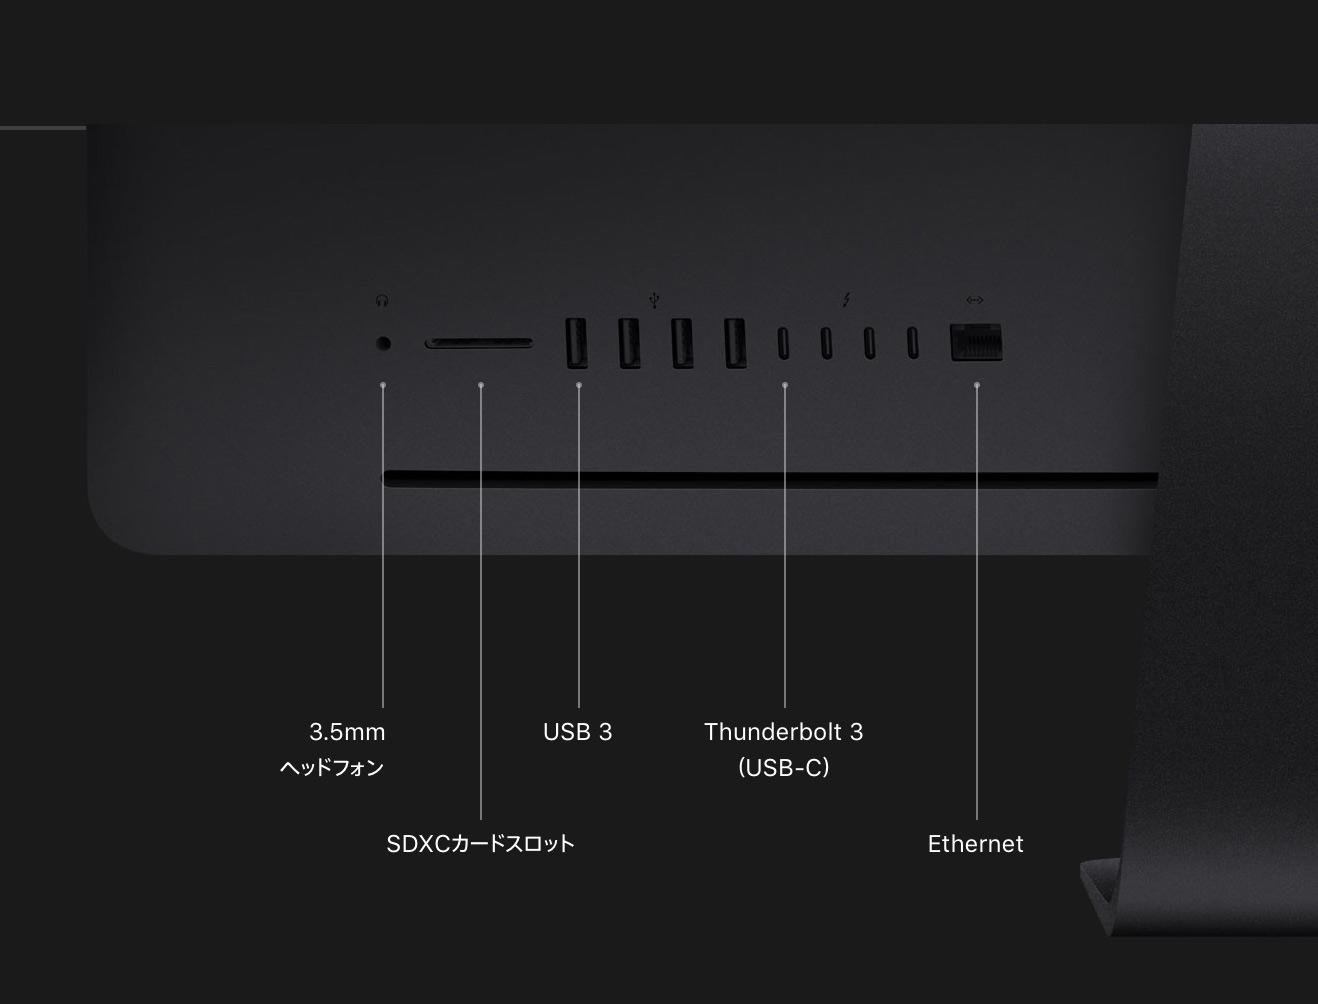 iMac Proの拡張と接続の配置写真